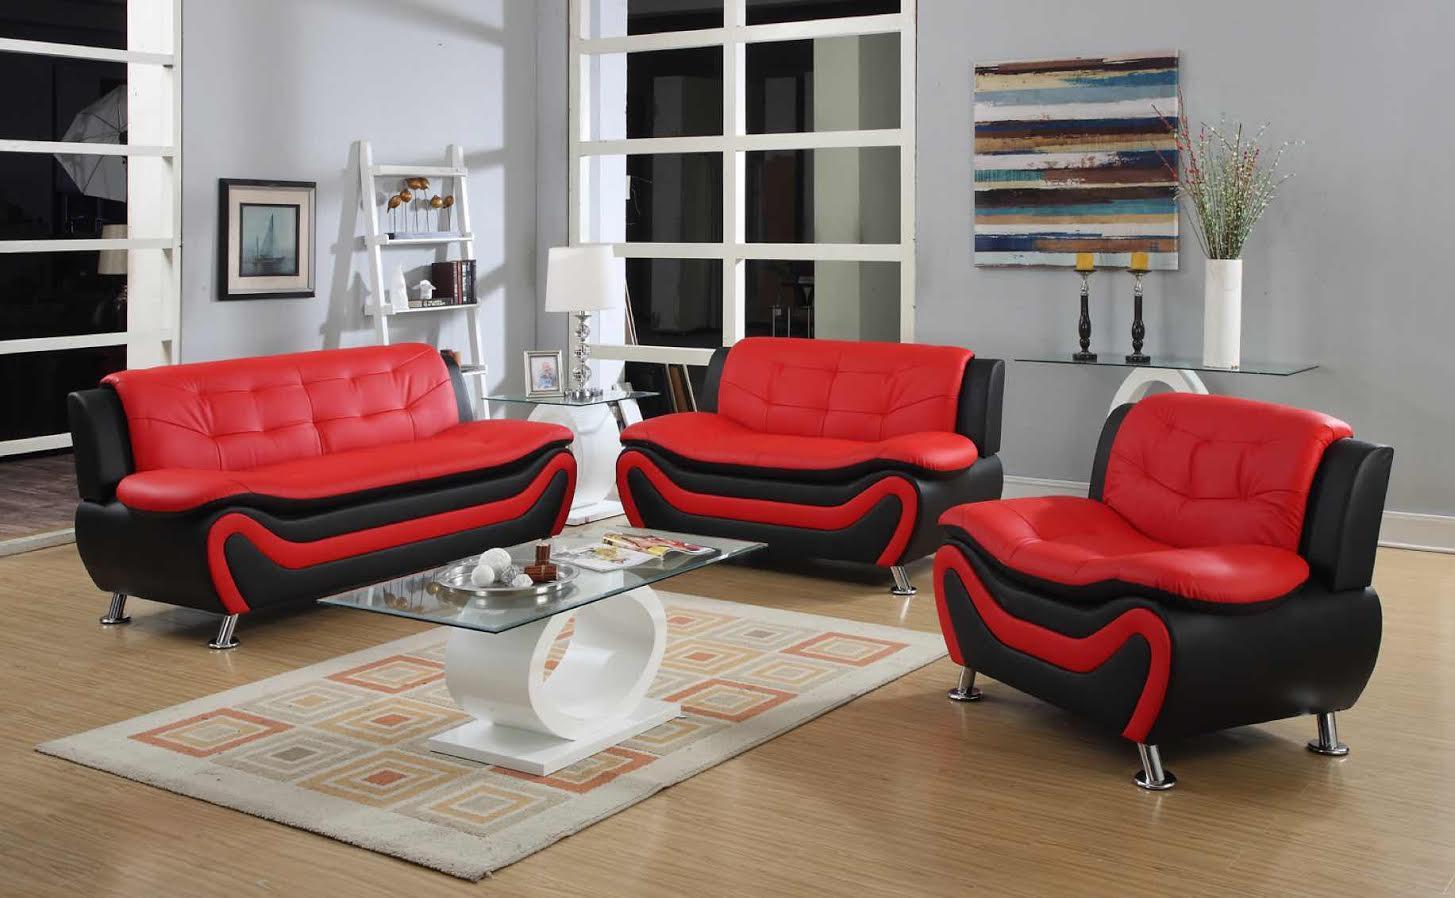 New 3 Pcs Designer Sofa Furniture Set Red Amp Black Sofa Set